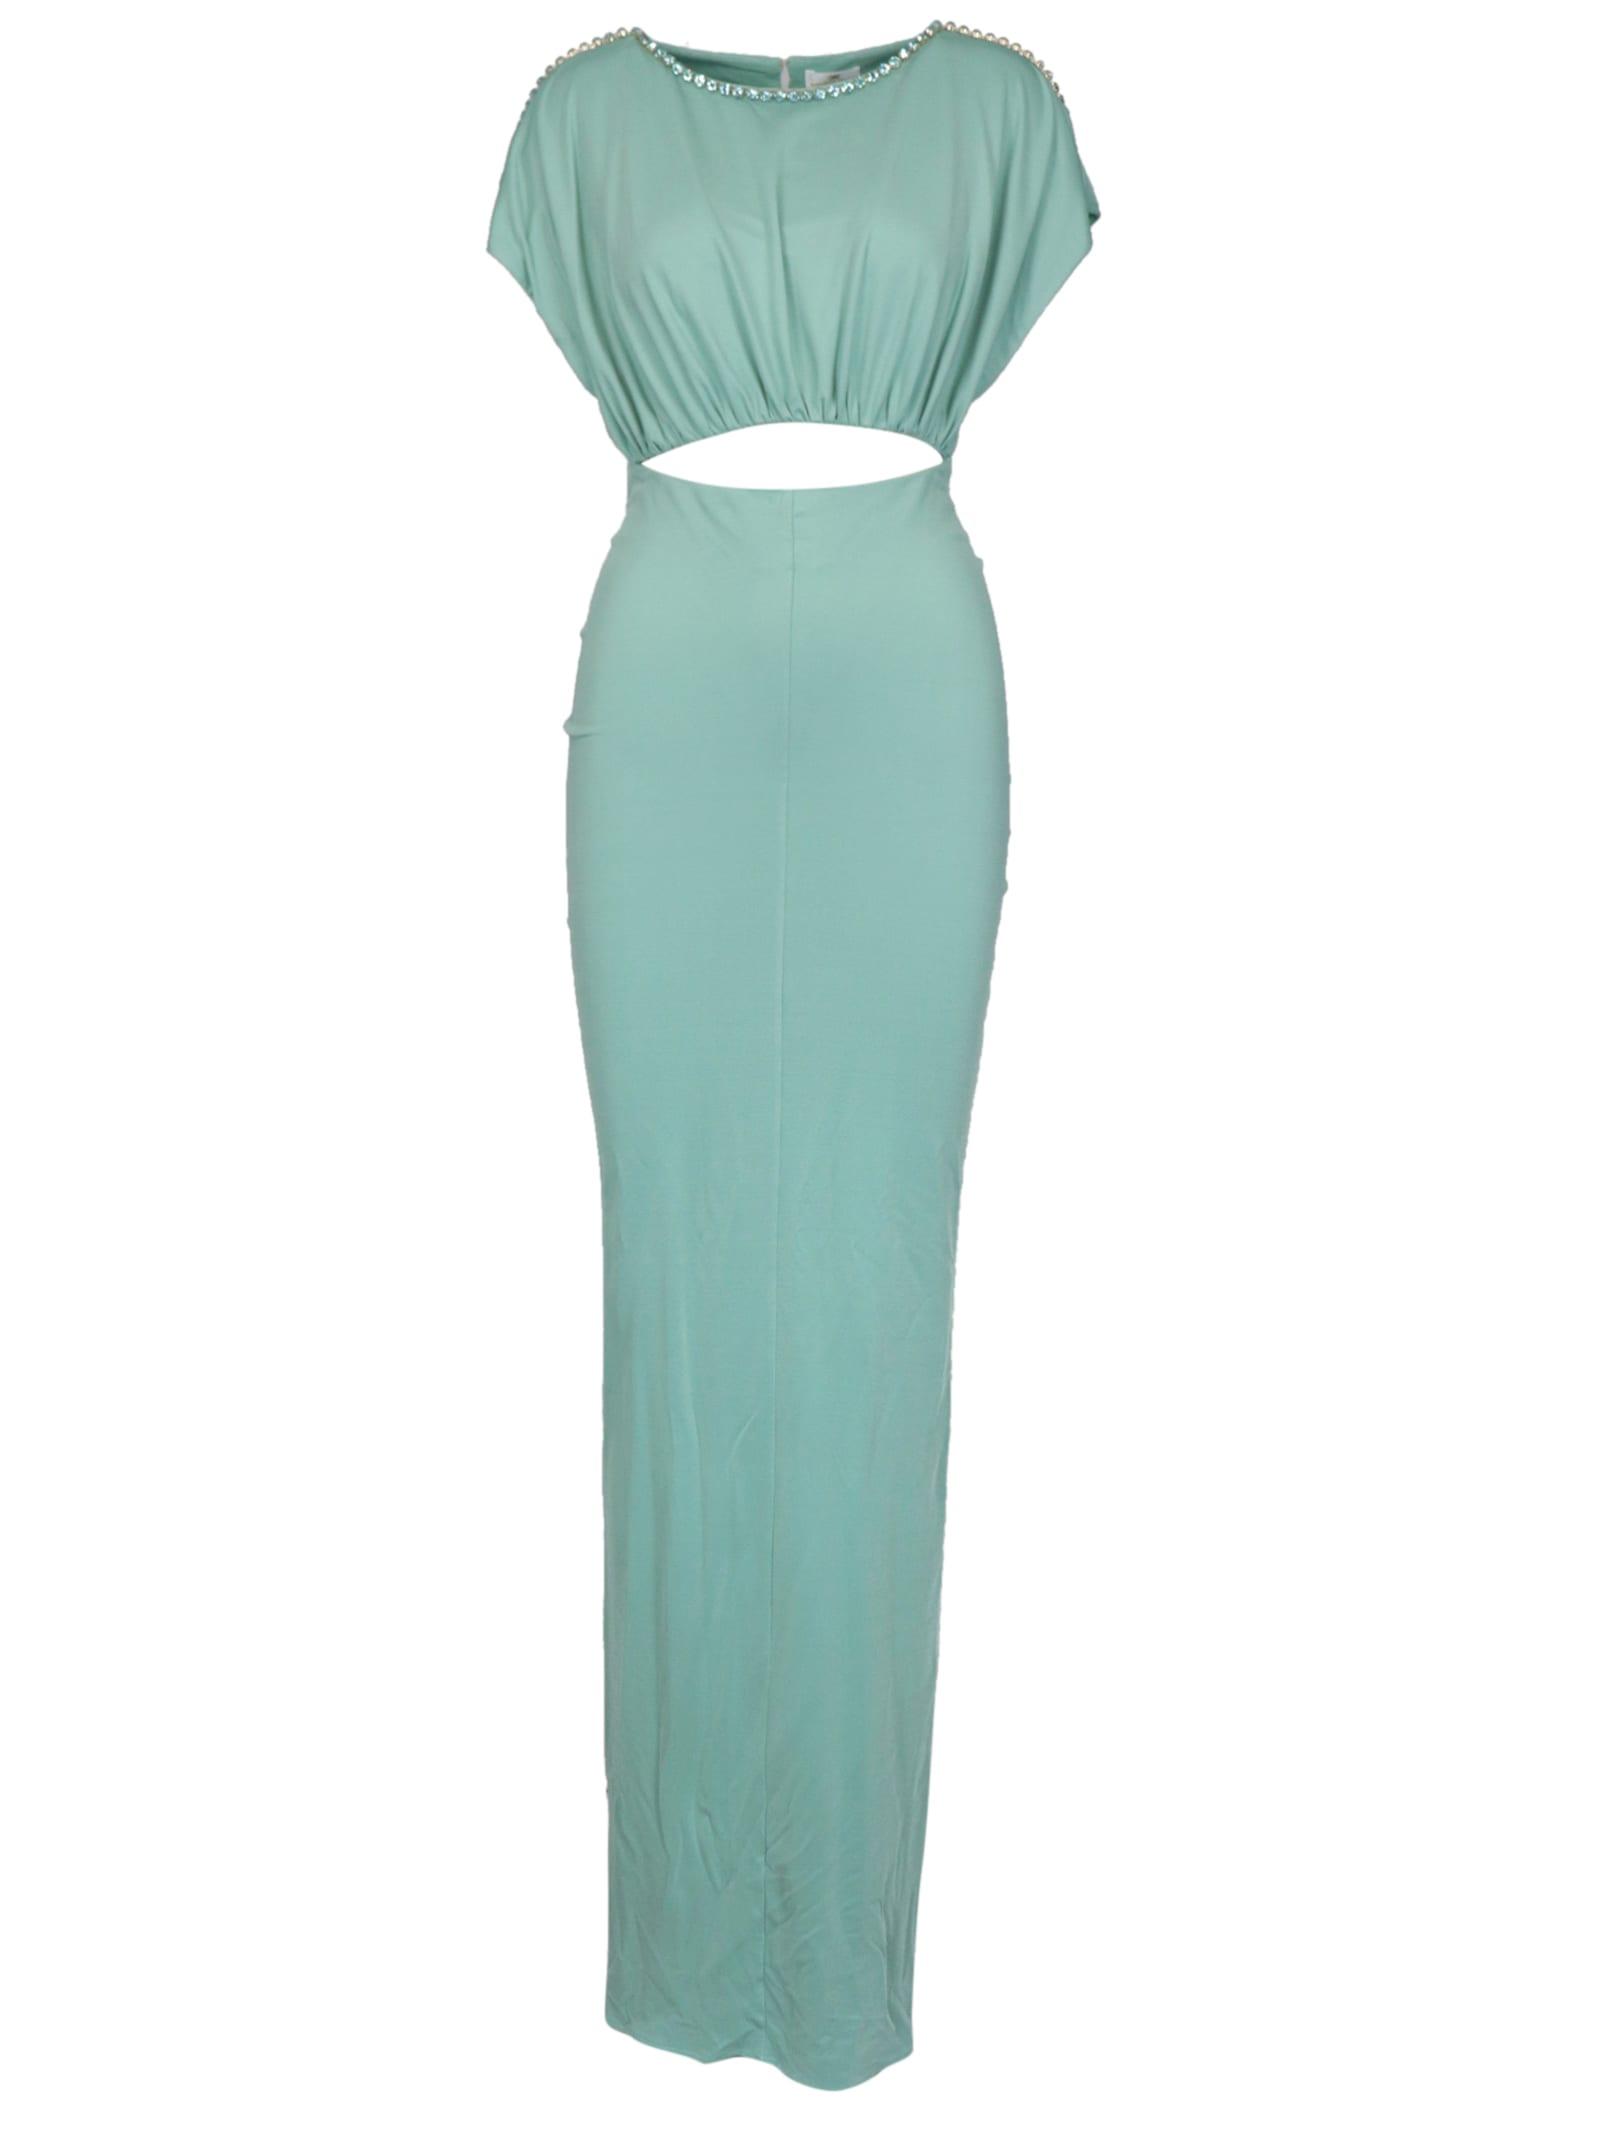 Buy Elisabetta Franchi Celyn B. Jersey Maxi Dress online, shop Elisabetta Franchi Celyn B. with free shipping